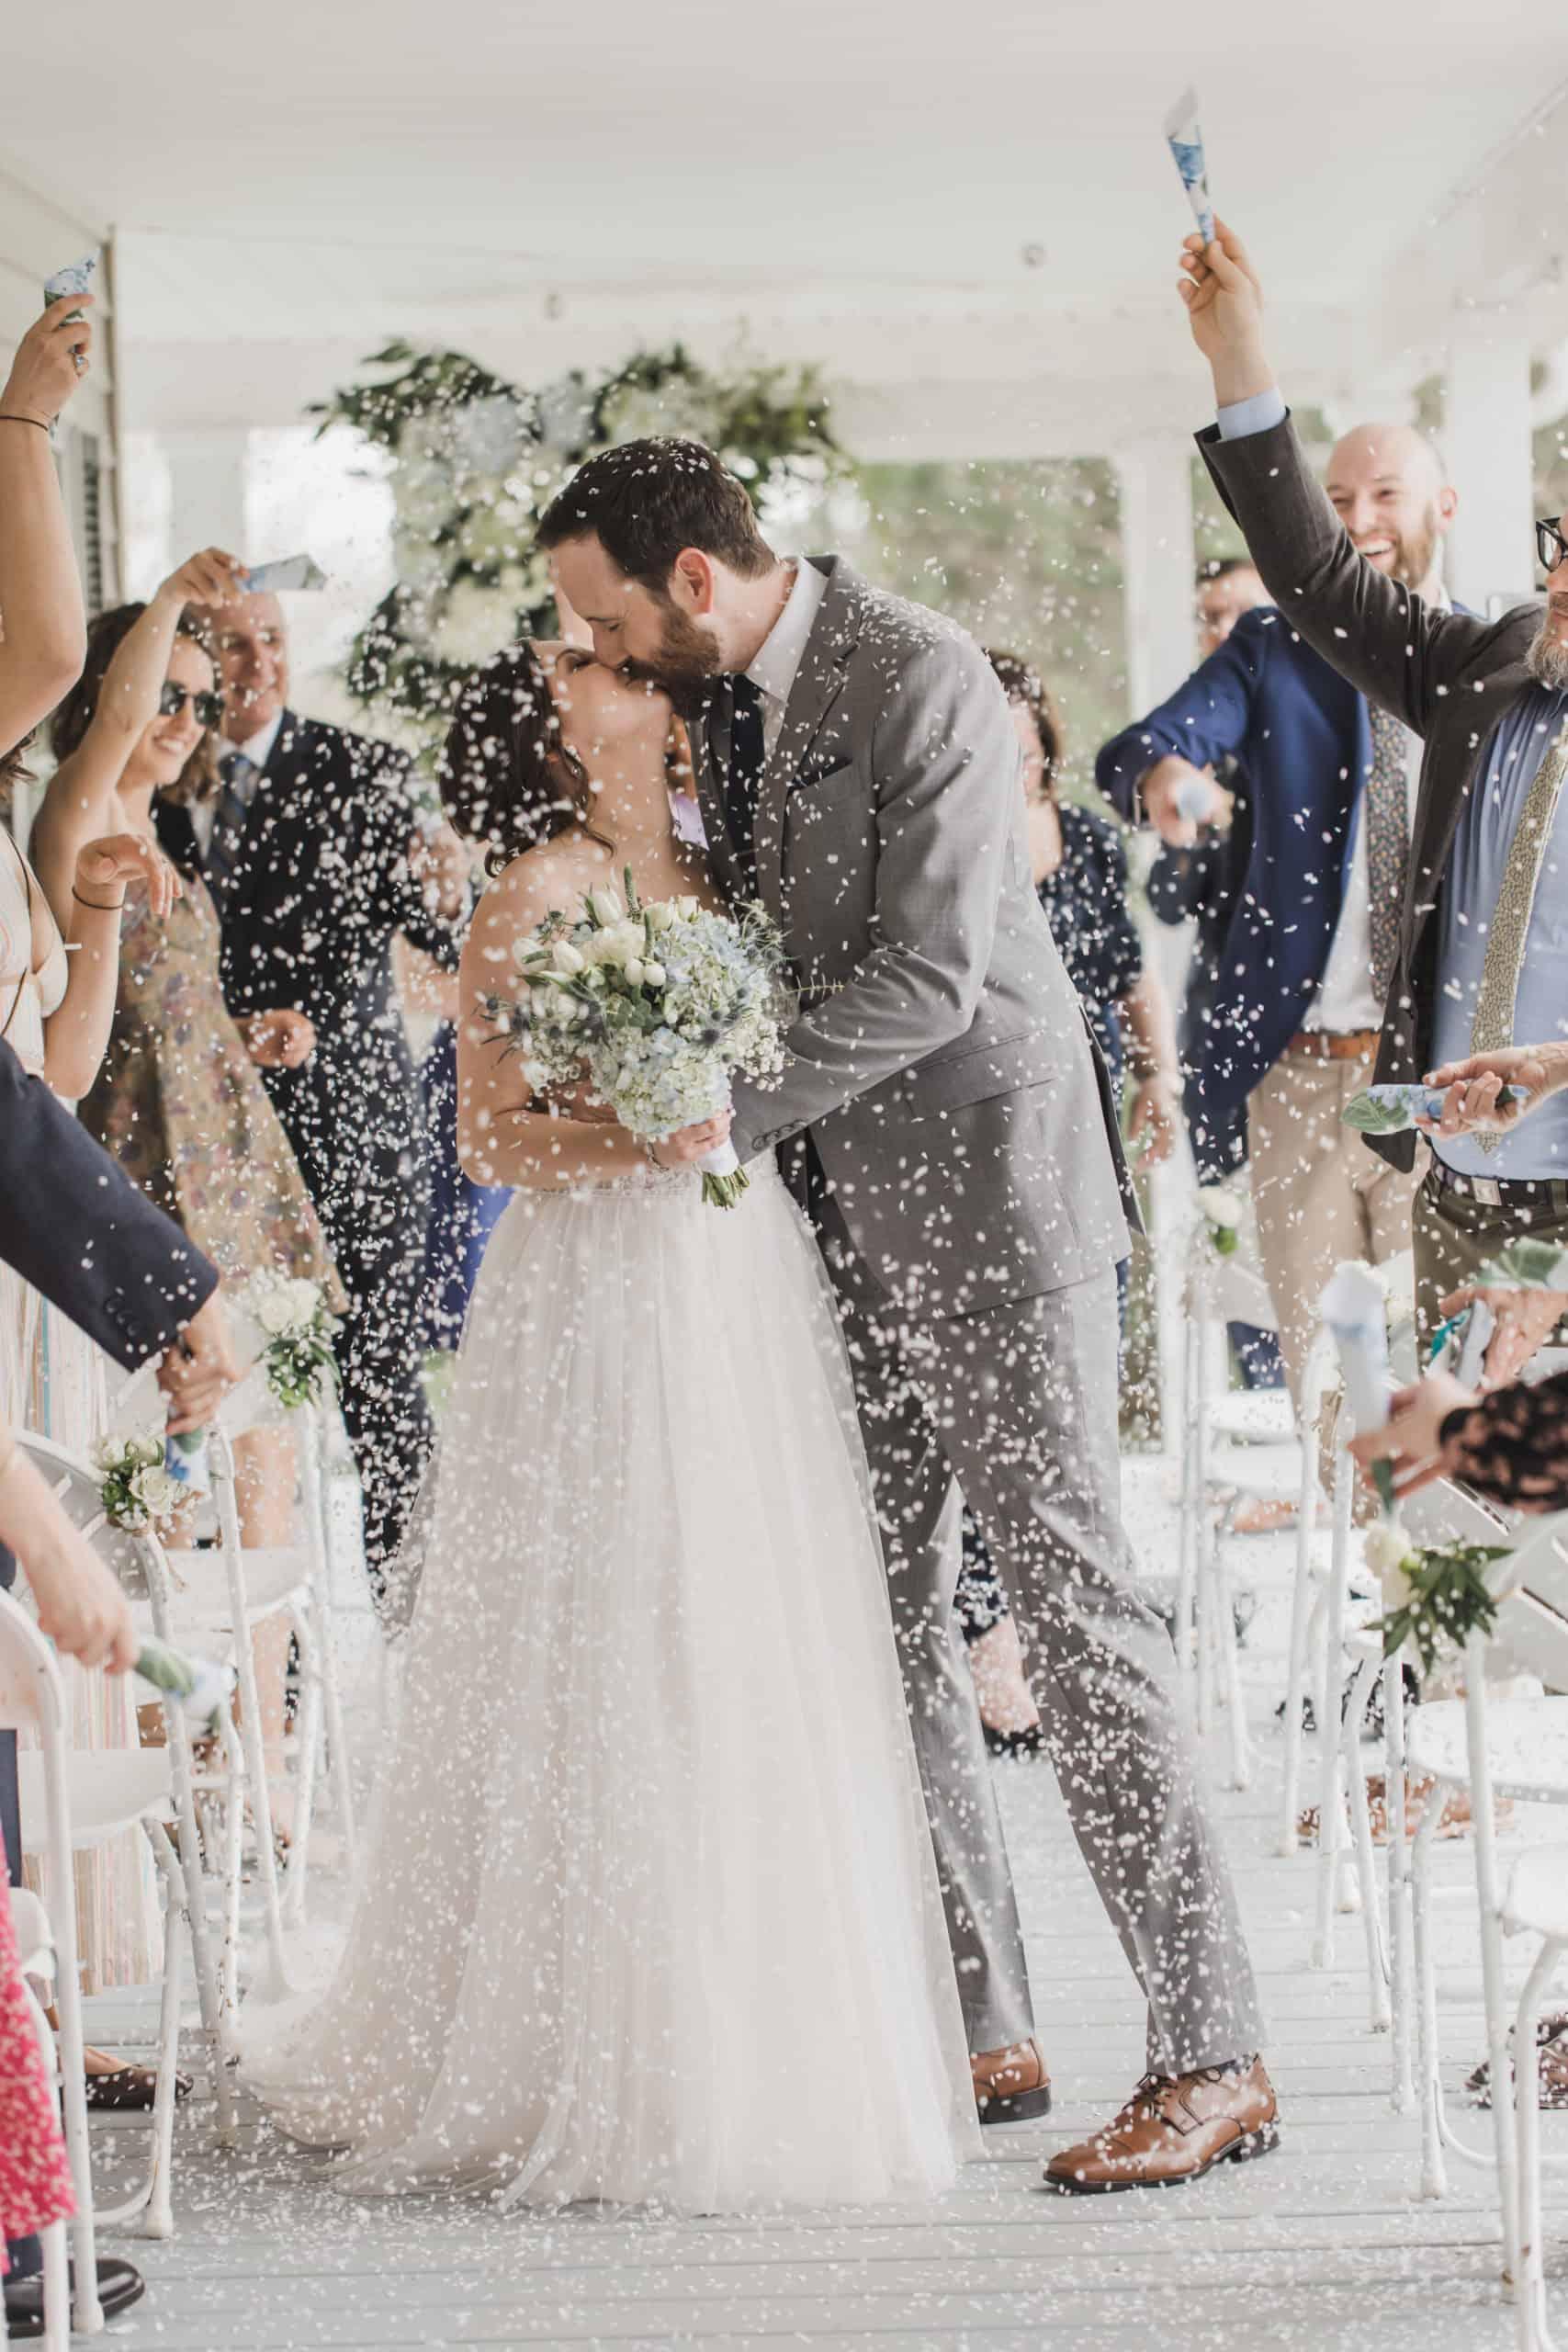 Intimate-wedding-ceremony-sam-and-aubrey-1-scaled Jpg